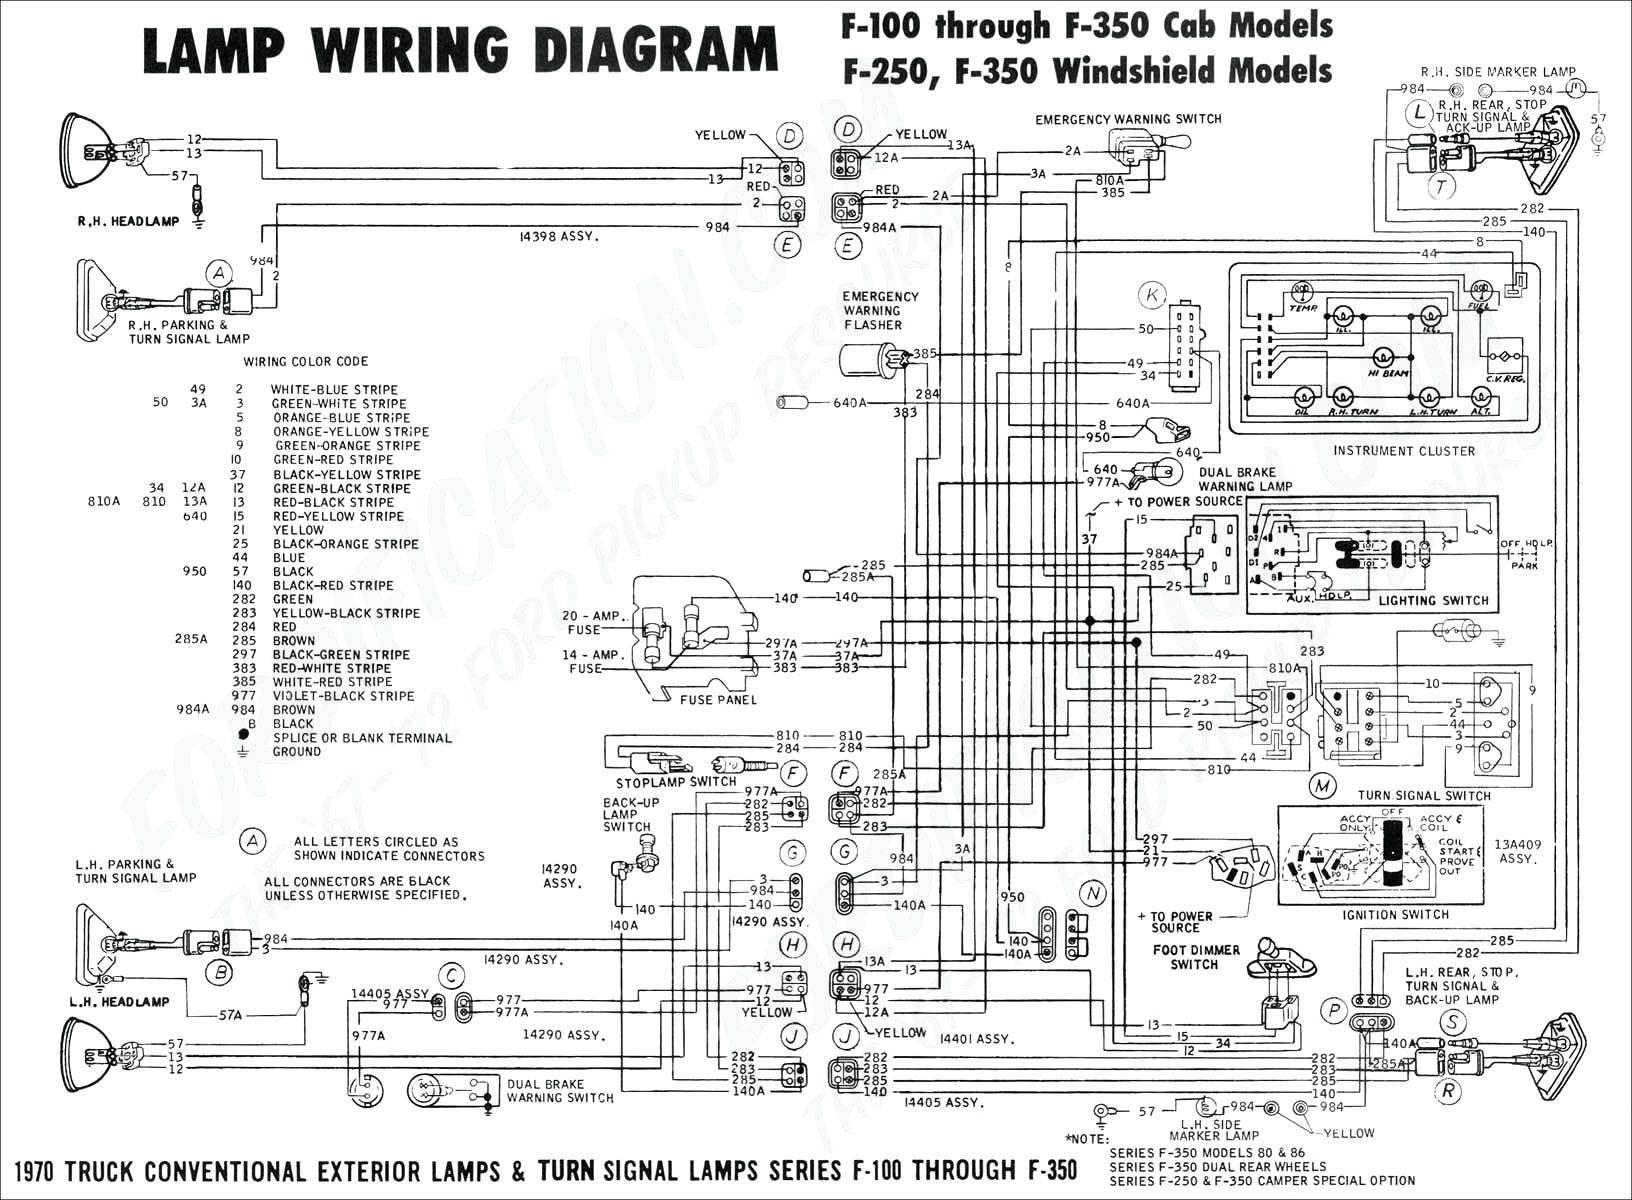 2005 ford f150 trailer wiring diagram free wiring diagram